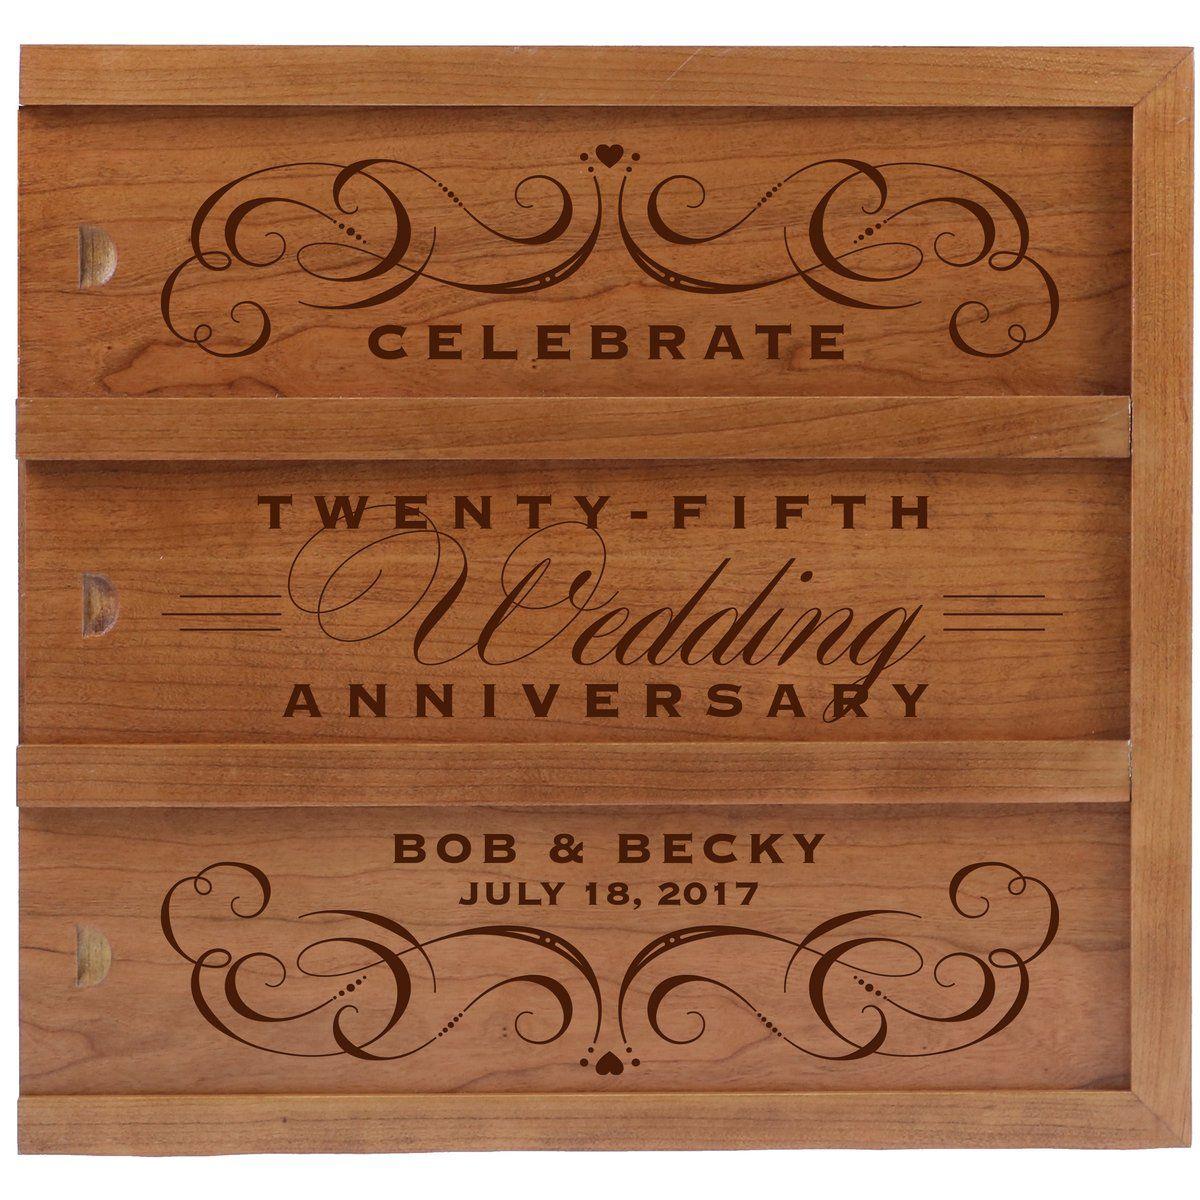 Celebrate Anniversary, Anniversary wine box, 25th